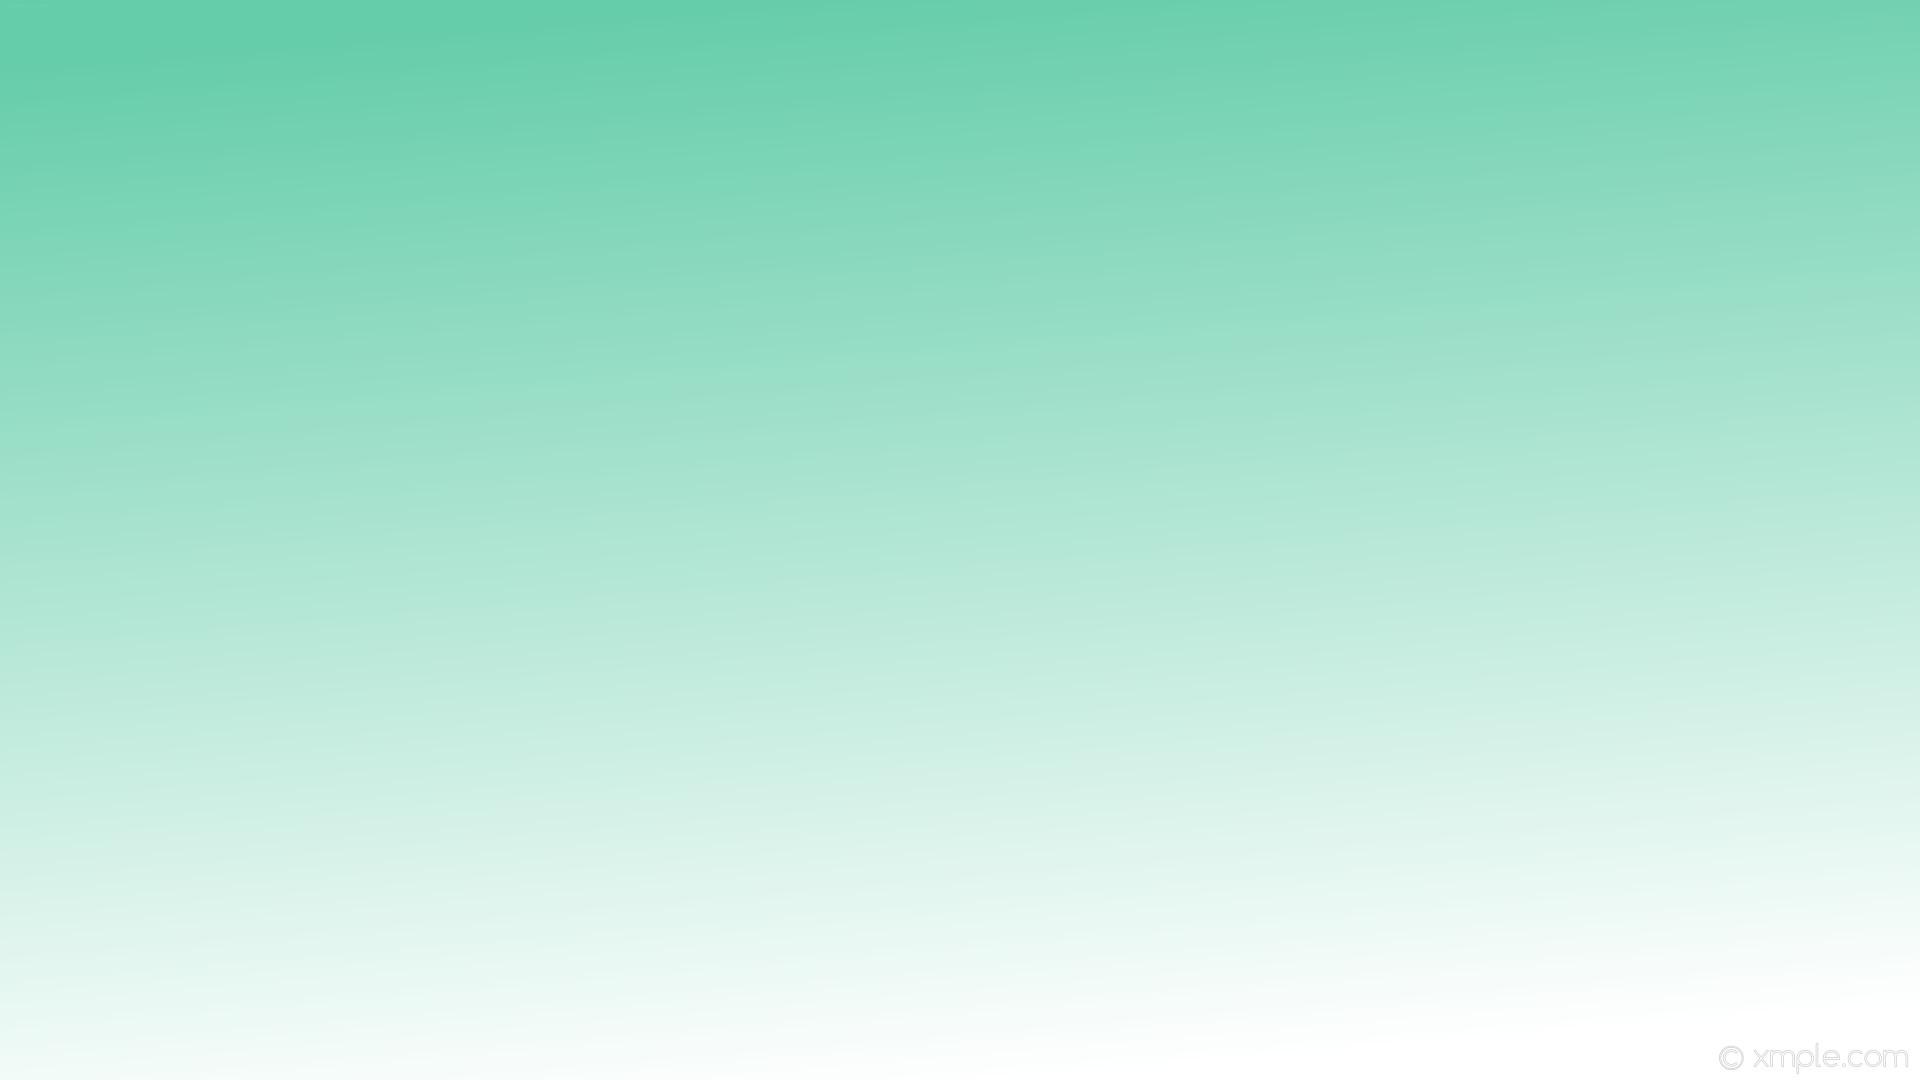 wallpaper white green linear gradient medium aquamarine #66cdaa #ffffff 105°